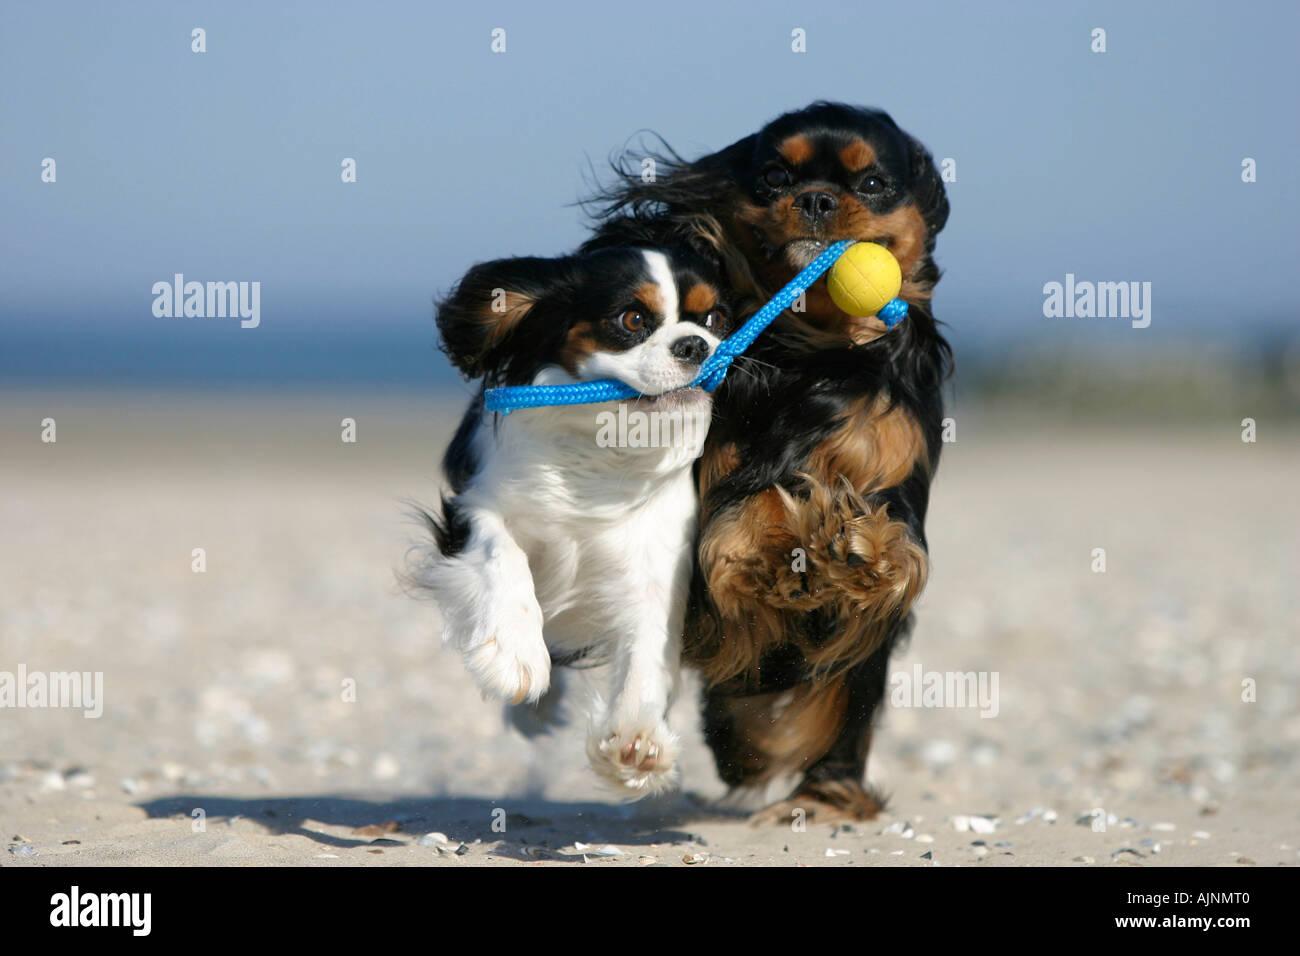 Cavalier King Charles Spaniel retrieving ball at beach Cavalier King Charles Spaniel apportieren Ball am Strand Spielzeug - Stock Image